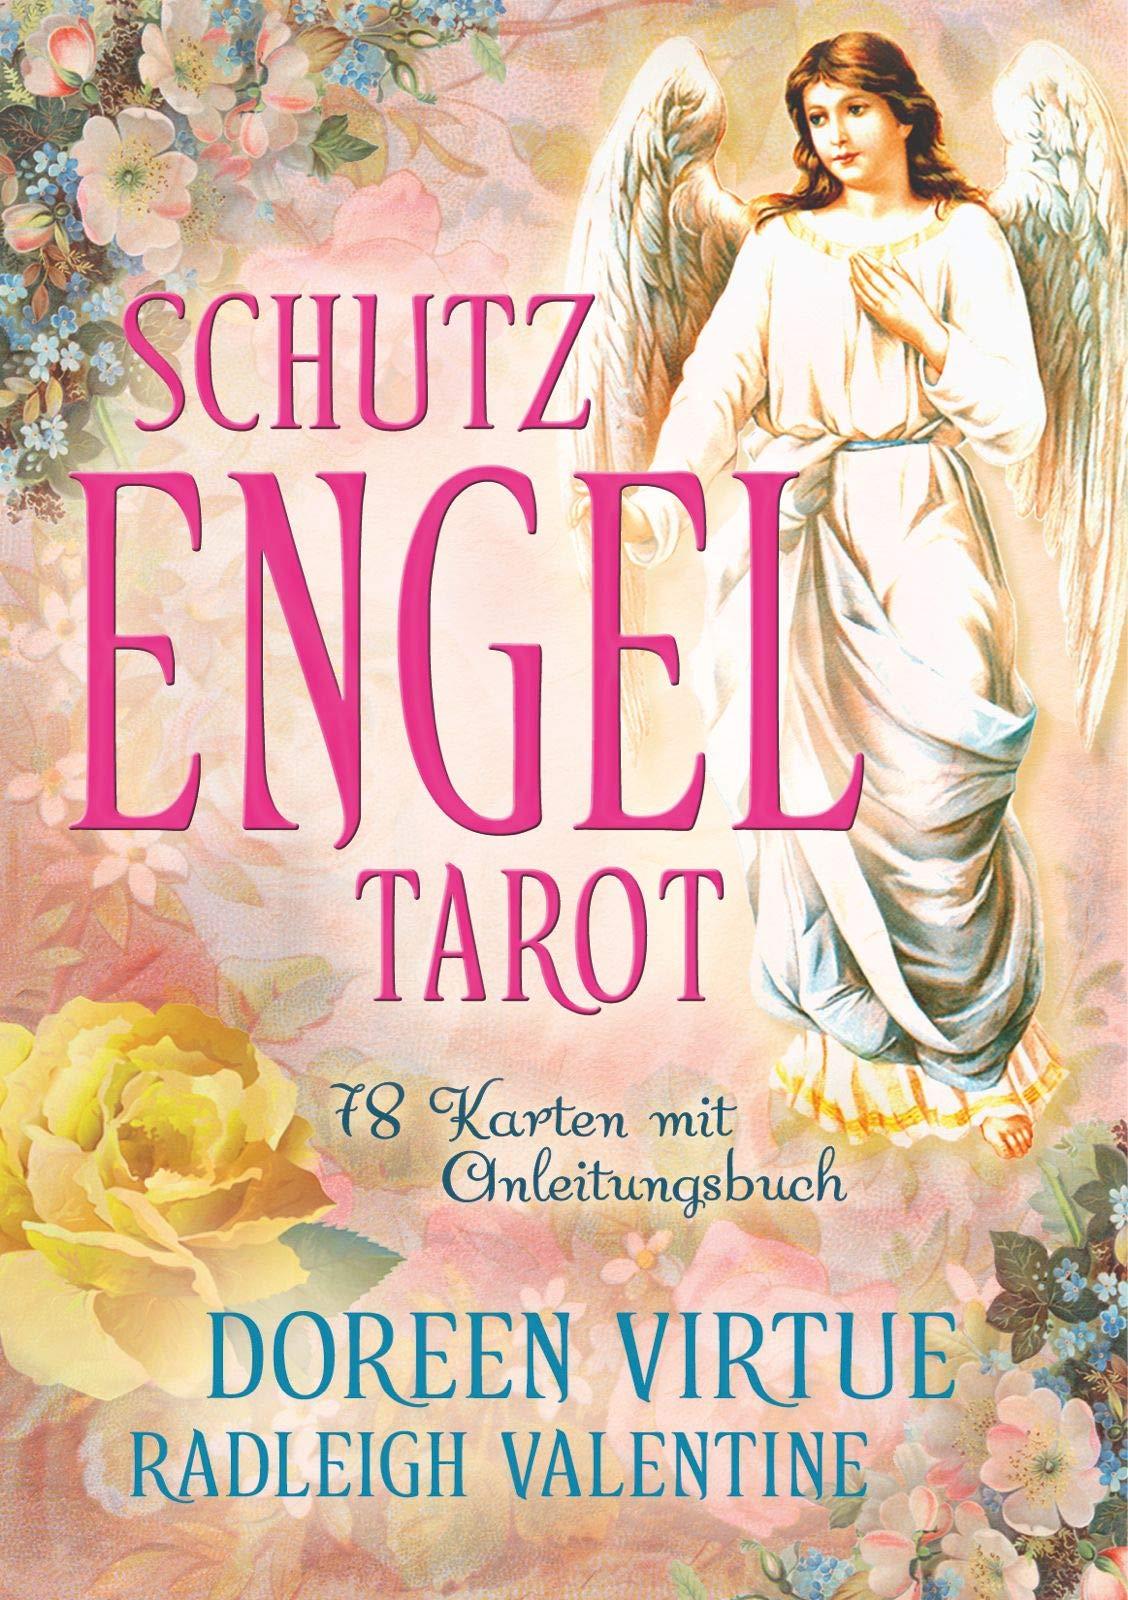 Schutzengel Tarot